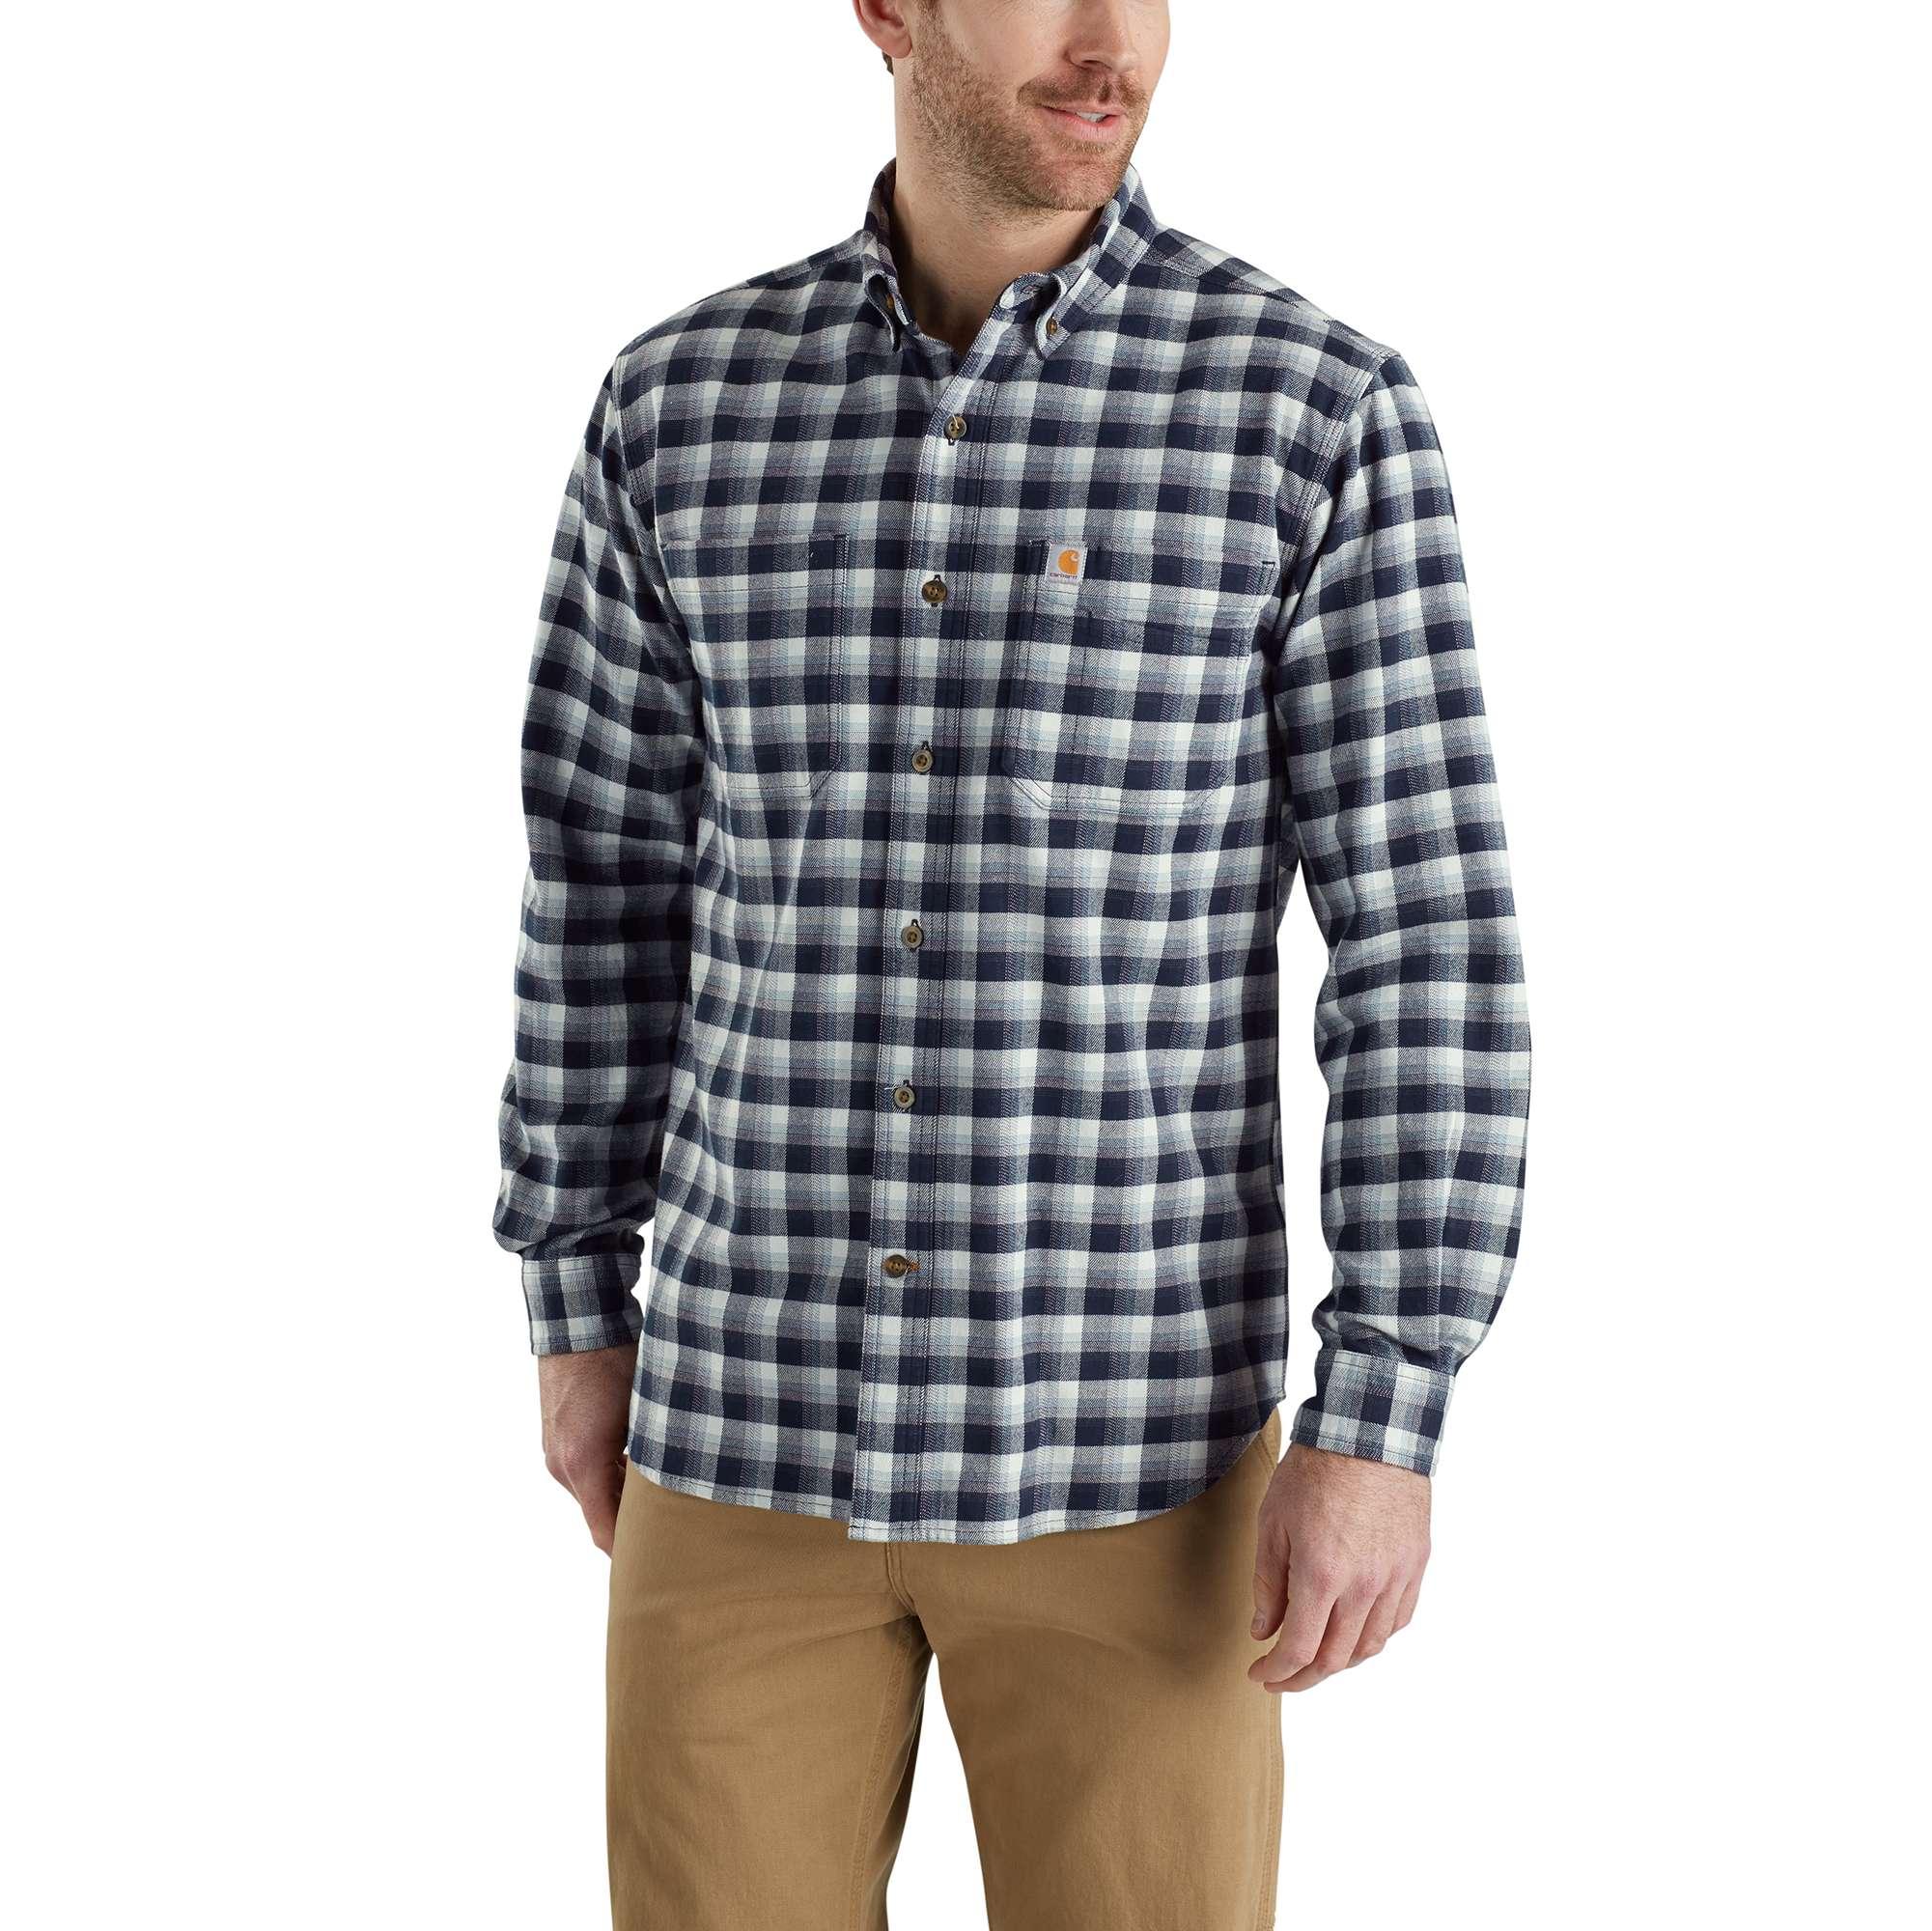 Men's Rugged Flex¨ Hamilton Plaid Long Sleeve Shirt, Navy, swatch